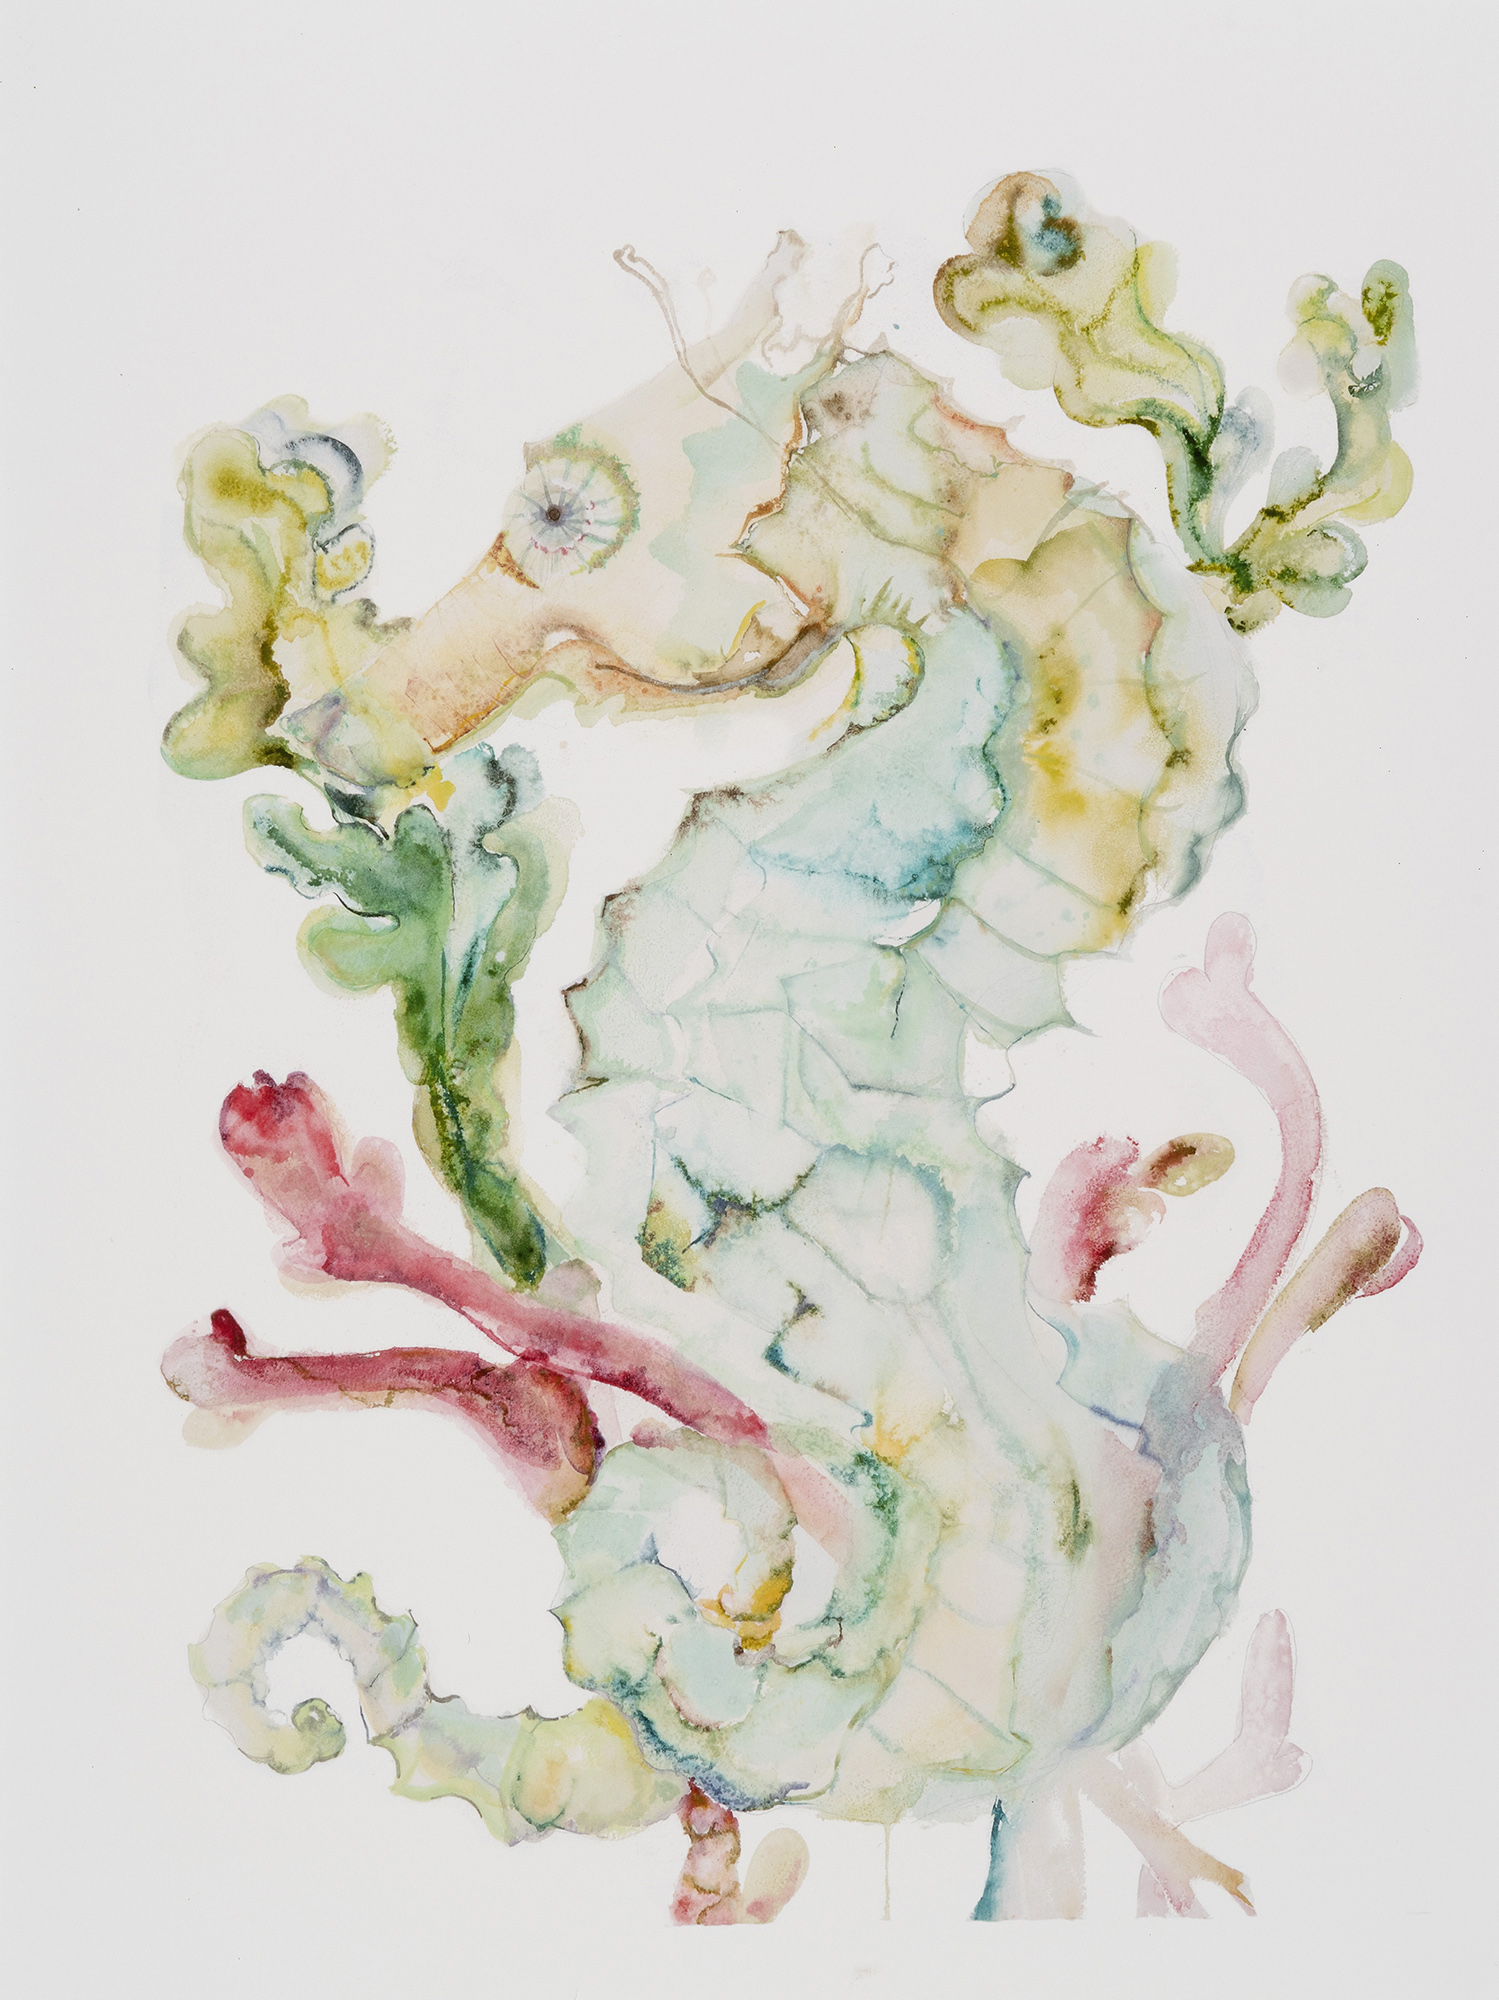 Seahorse II (Hawaii Seahorse), 2014, Watercolor on paper, 24 x 18 in.